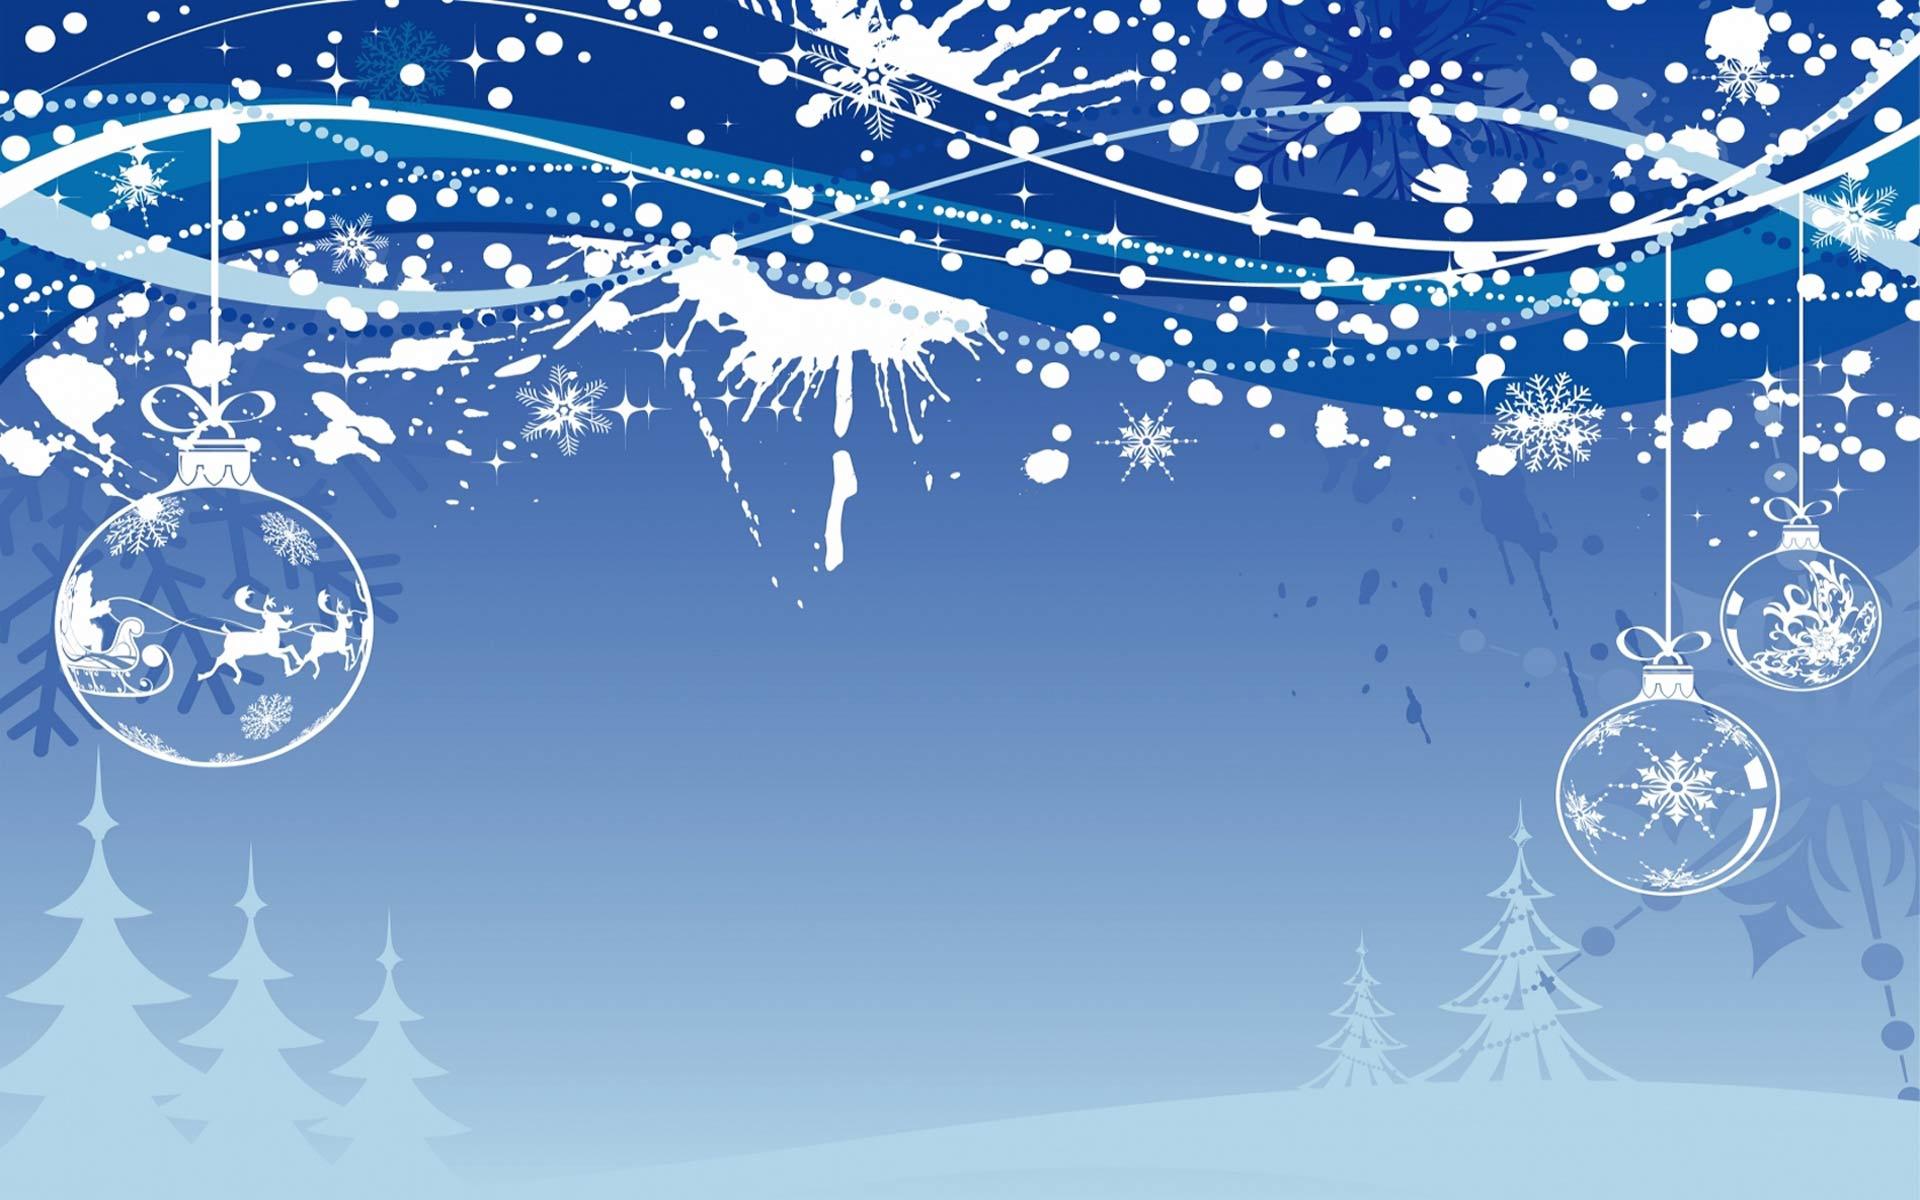 50] Christmas Desktop Holiday Wallpaper on WallpaperSafari 1920x1200